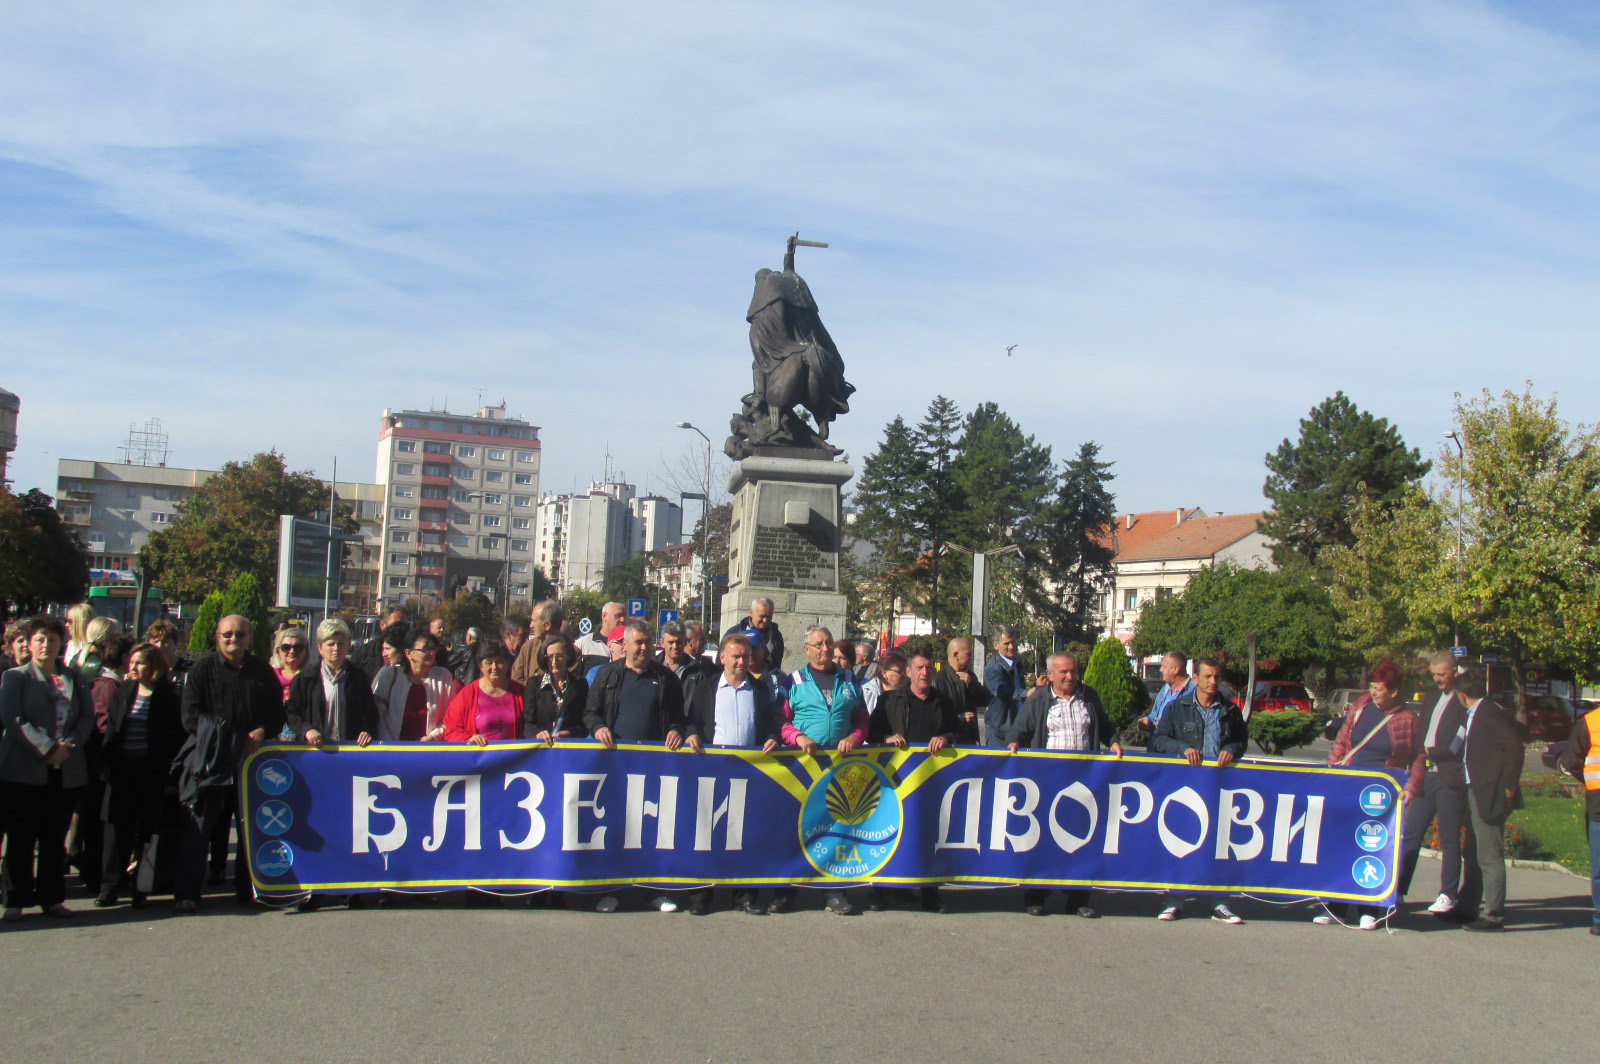 Štrajkači iz Banje Dvorovi pred Gradskom upravom